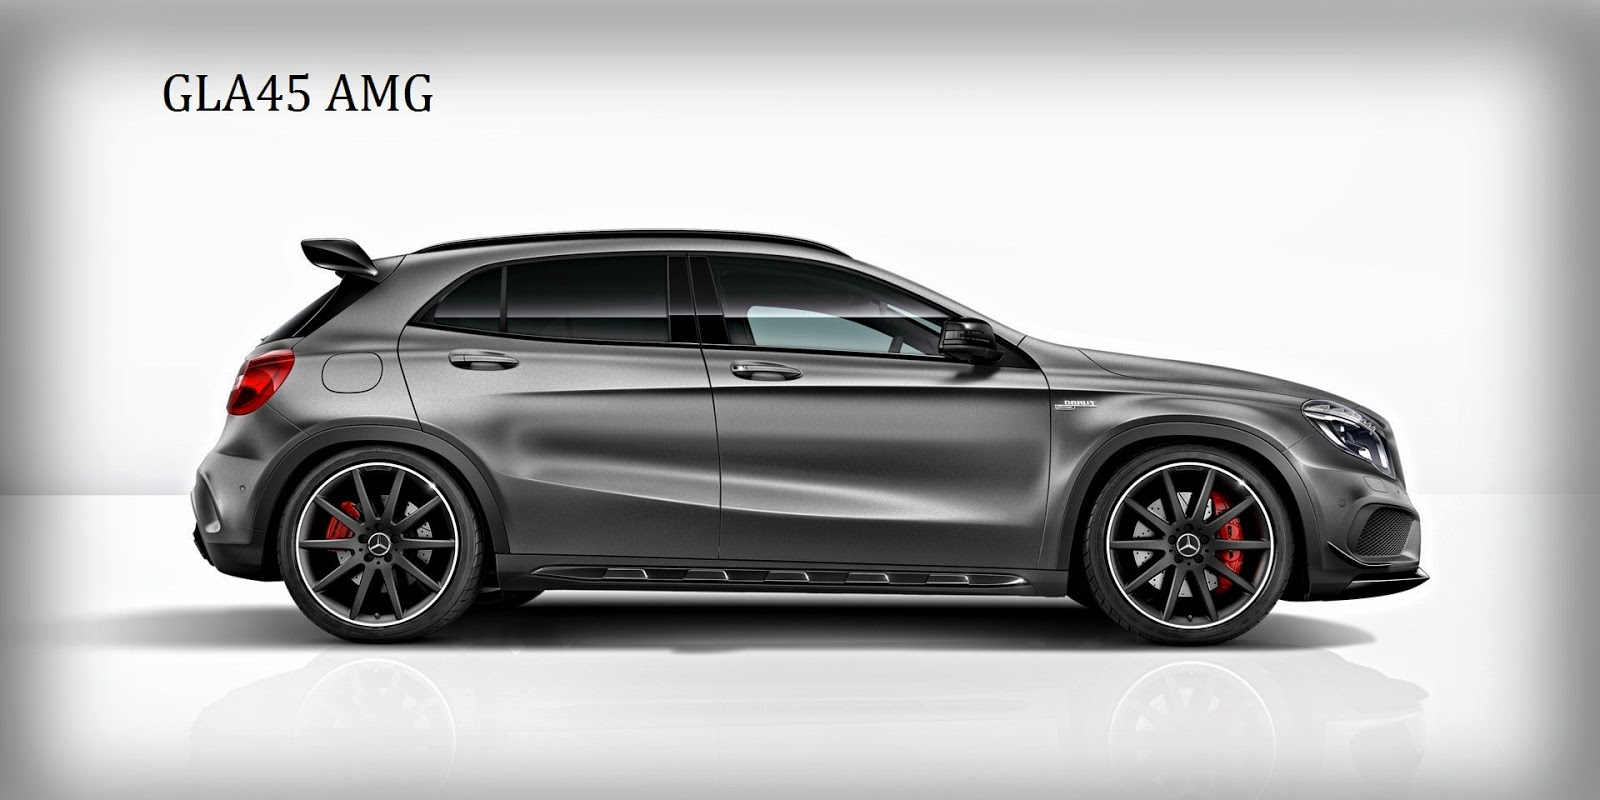 2015 mercedes benz gla45 amg 2 0 liter turbo 355hp car reviews new car pictures for 2018 2019. Black Bedroom Furniture Sets. Home Design Ideas